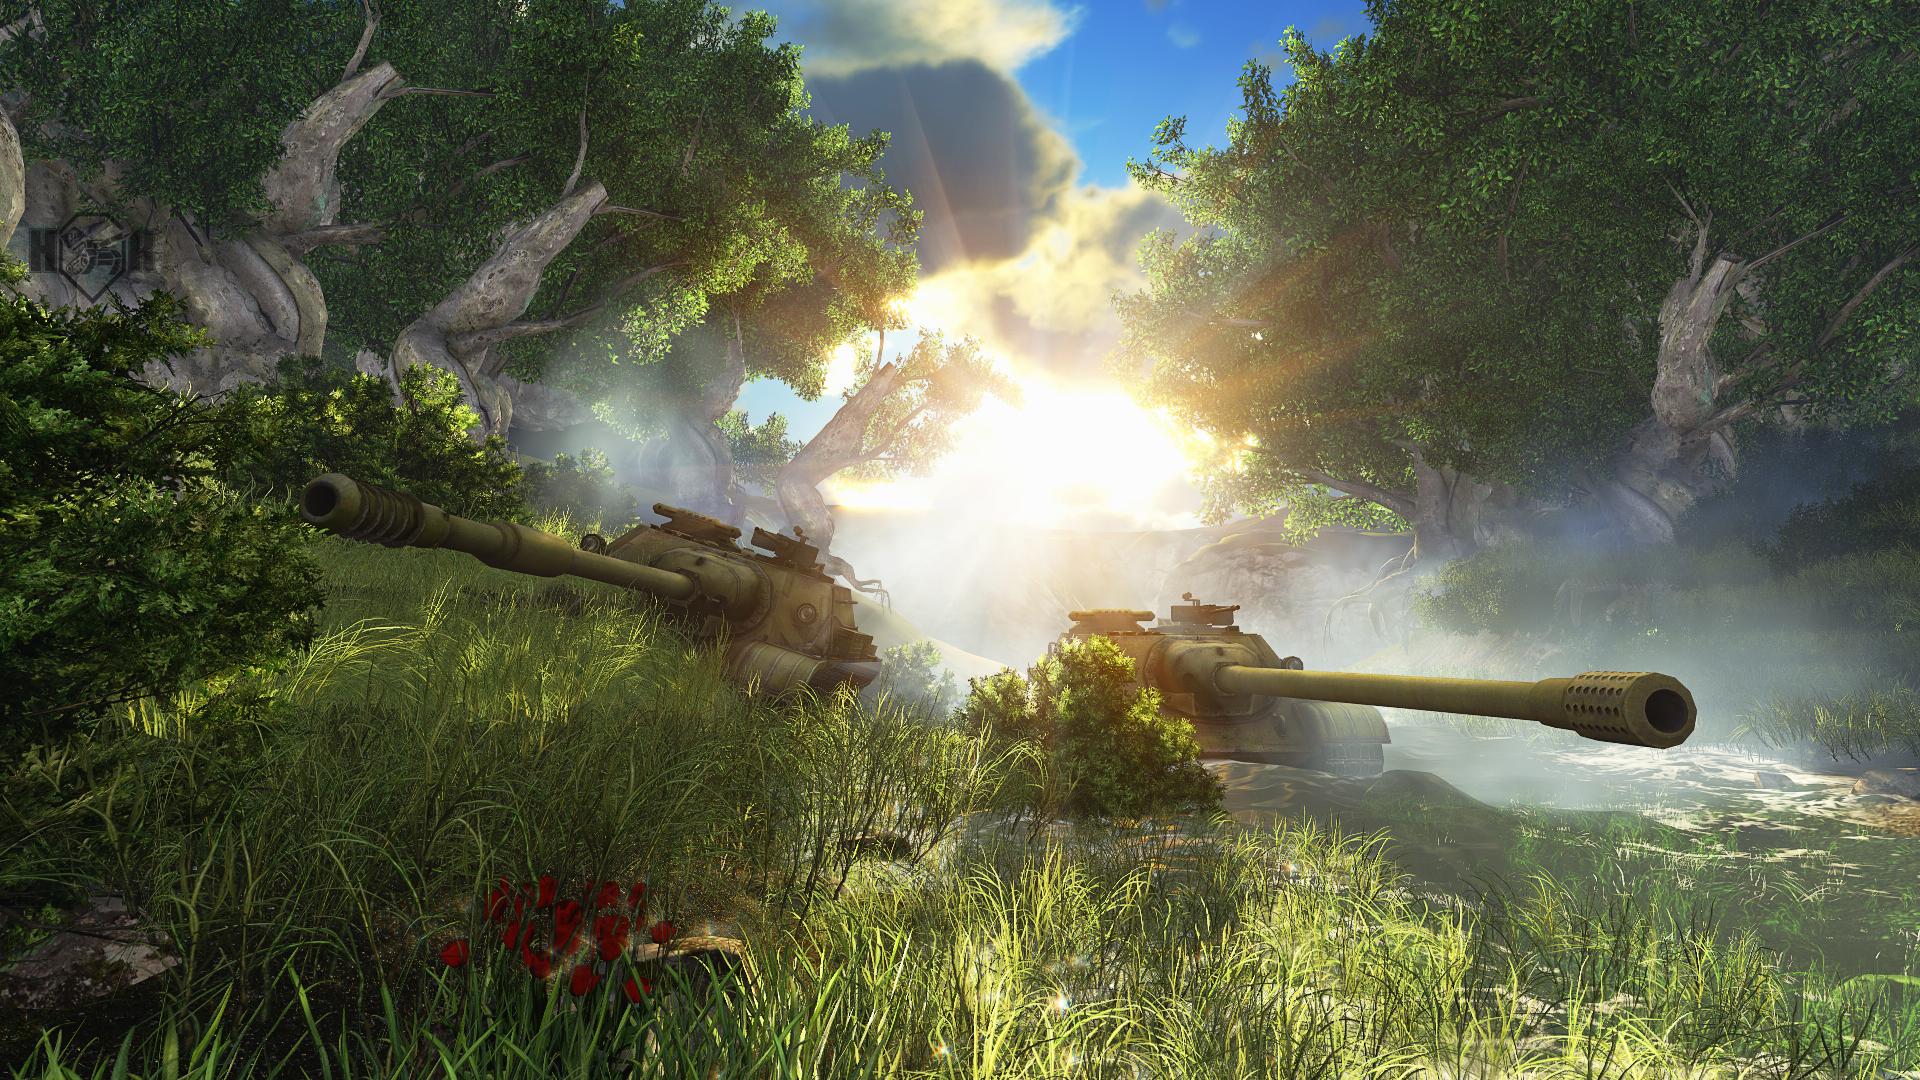 Wallpaper Sunlight Forest Jungle World Of Tanks Su 122 54